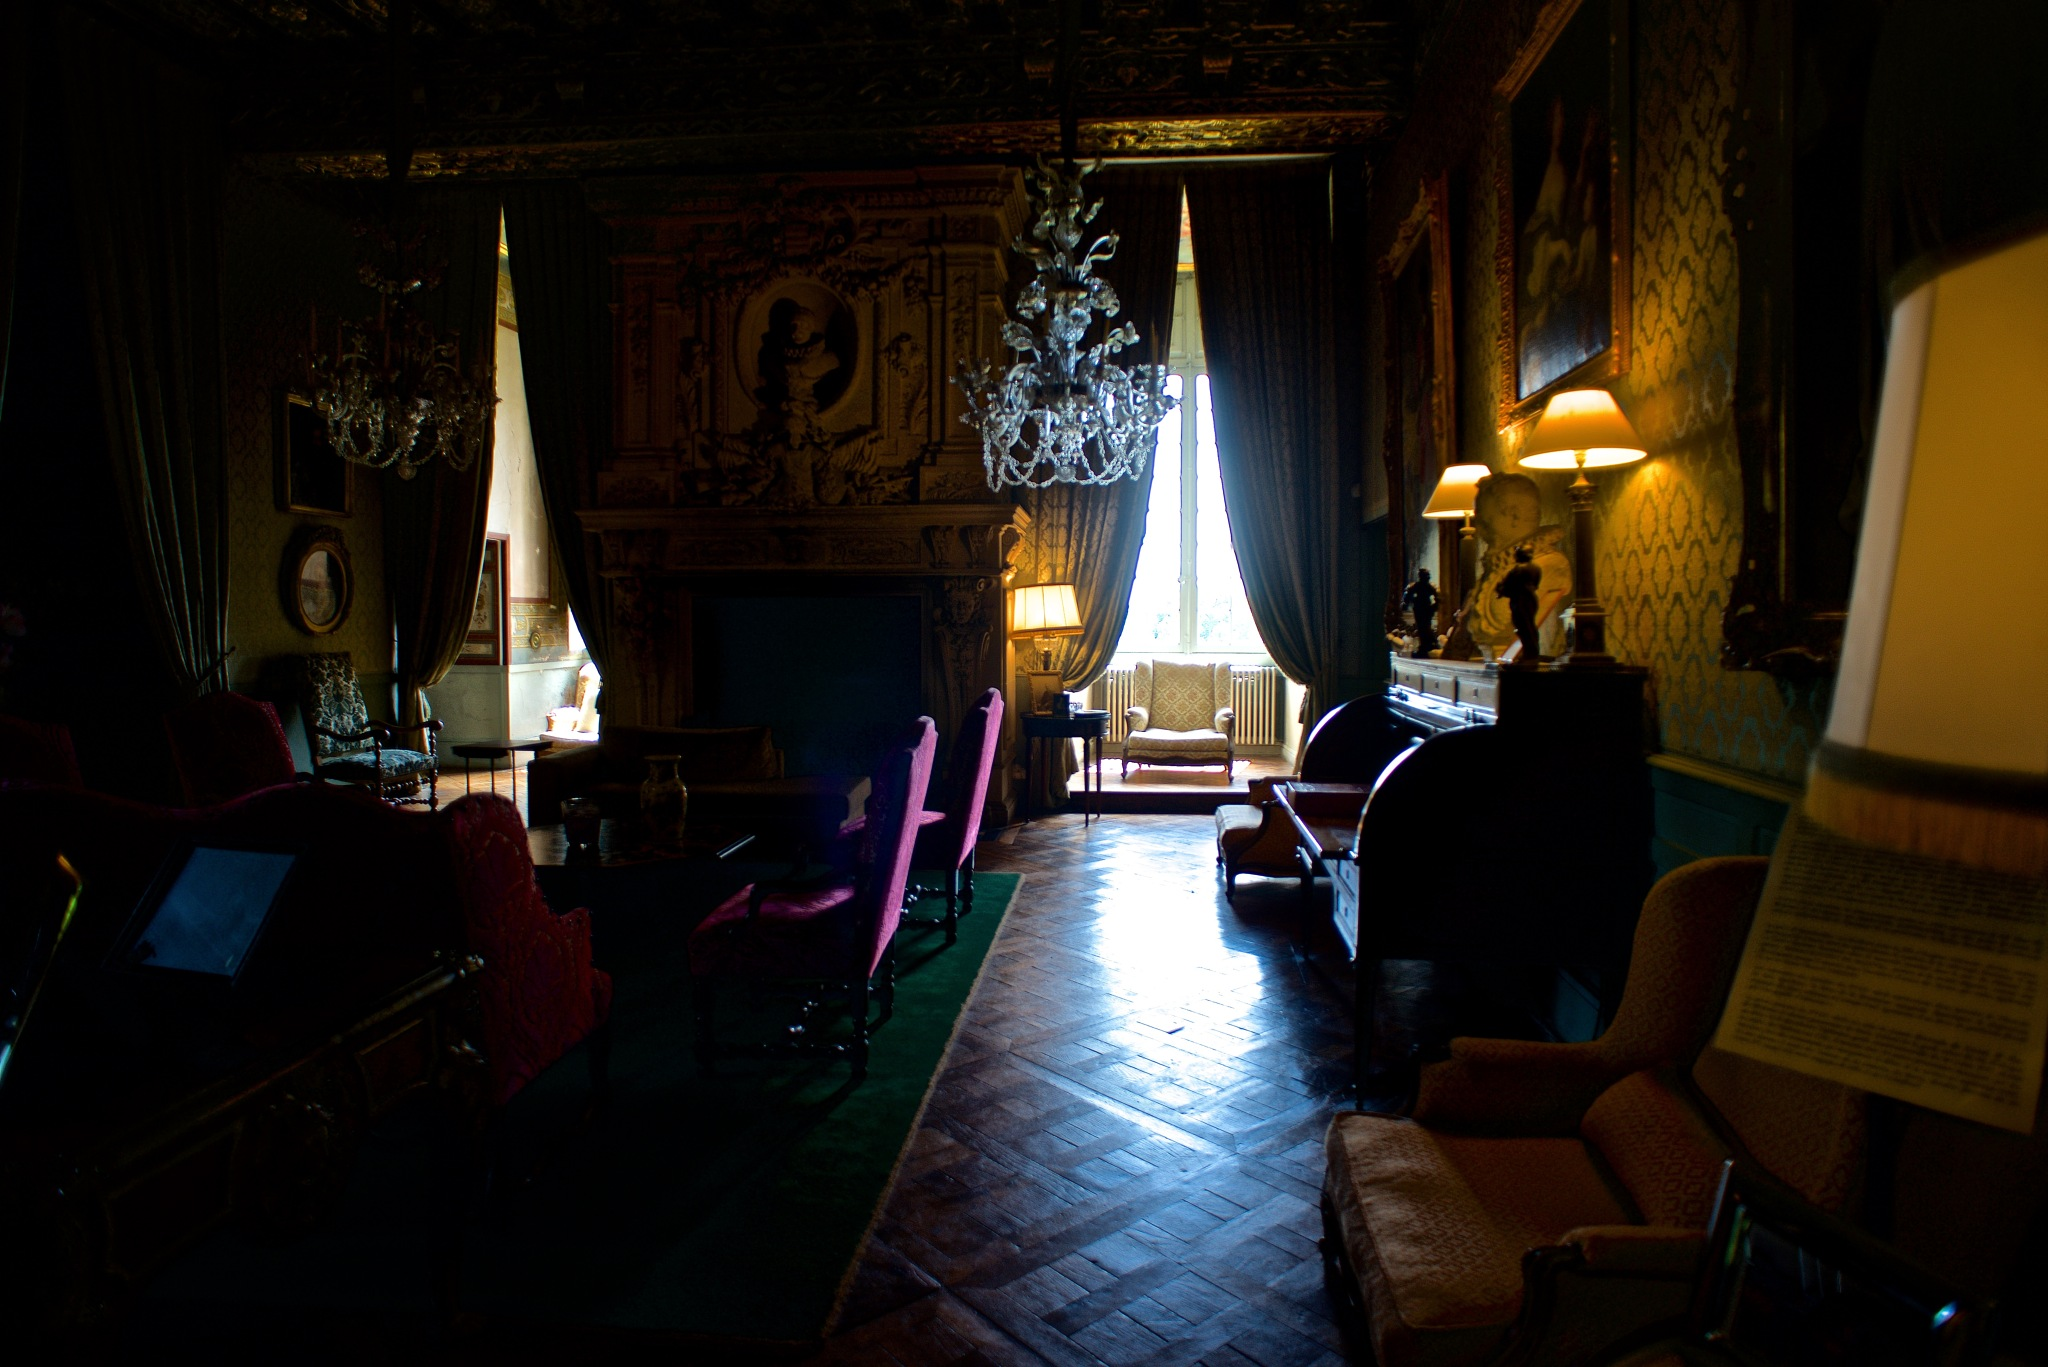 Interior view Château de Brissac by michael.summers.100